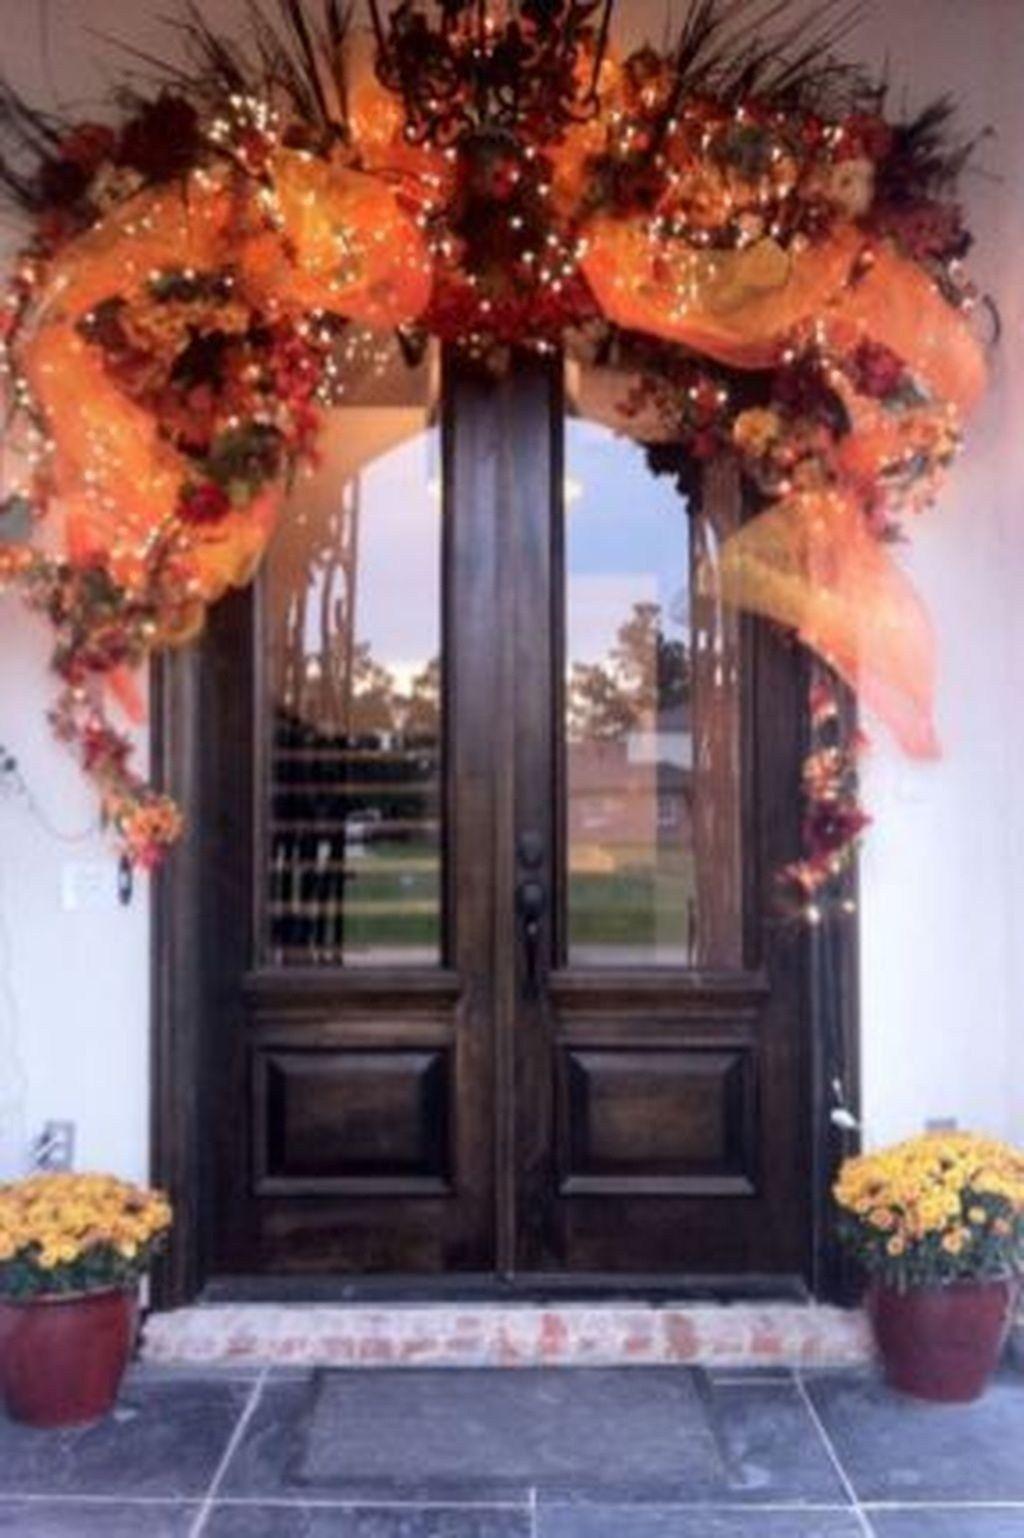 50 Amazing Fall Decorating Ideas To Transform Your Interiors 50 Amazing Fall Decorating Ideas To Transform Your Interiors interior